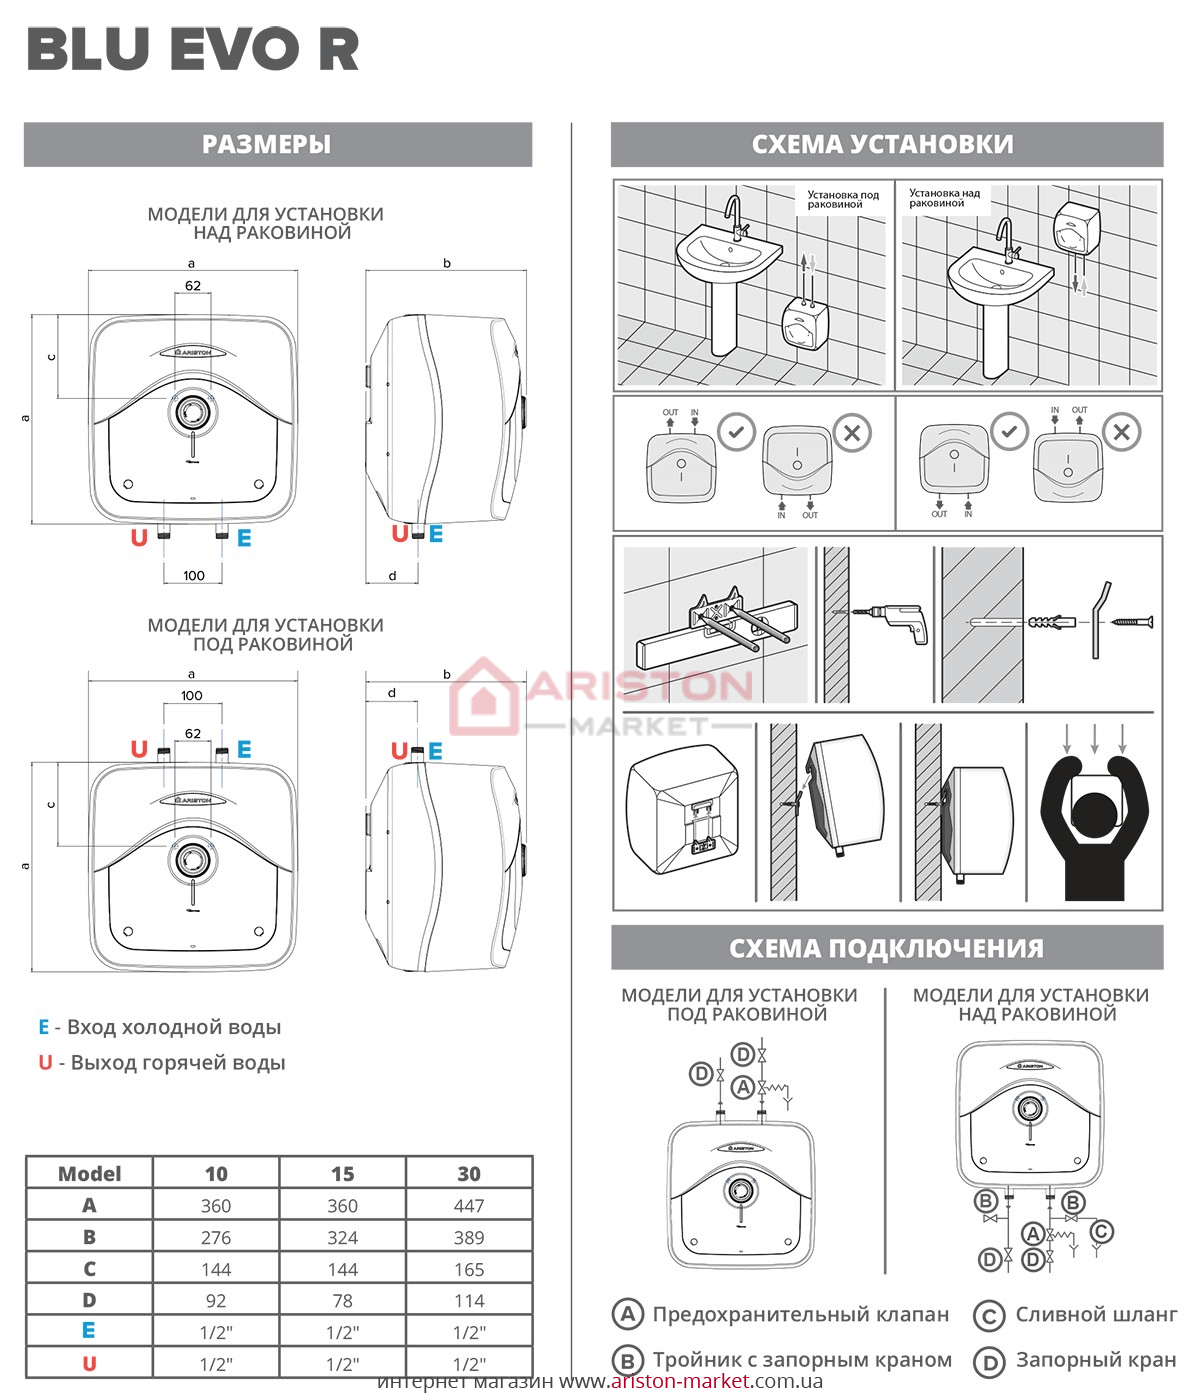 Ariston BLU Evo R 30/3 схема, габариты, чертеж